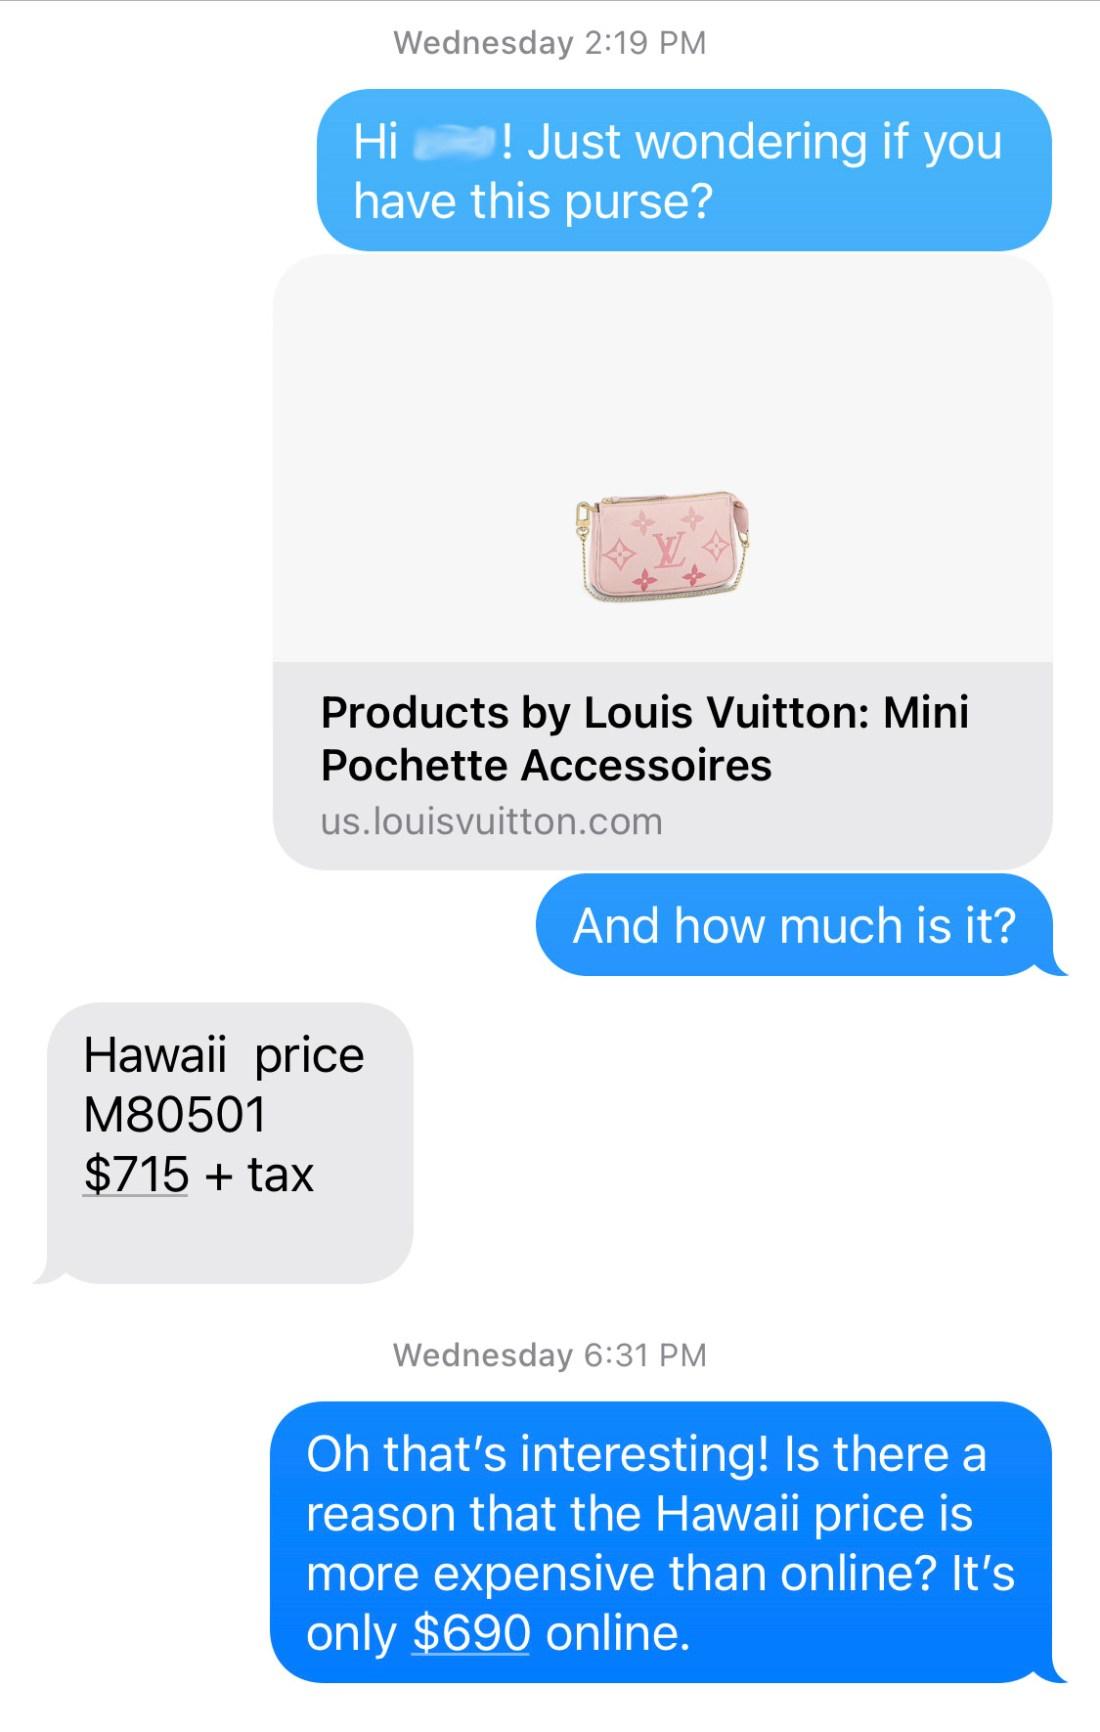 Text chat with Louis Vuitton Sales Associate about Mini Pochette